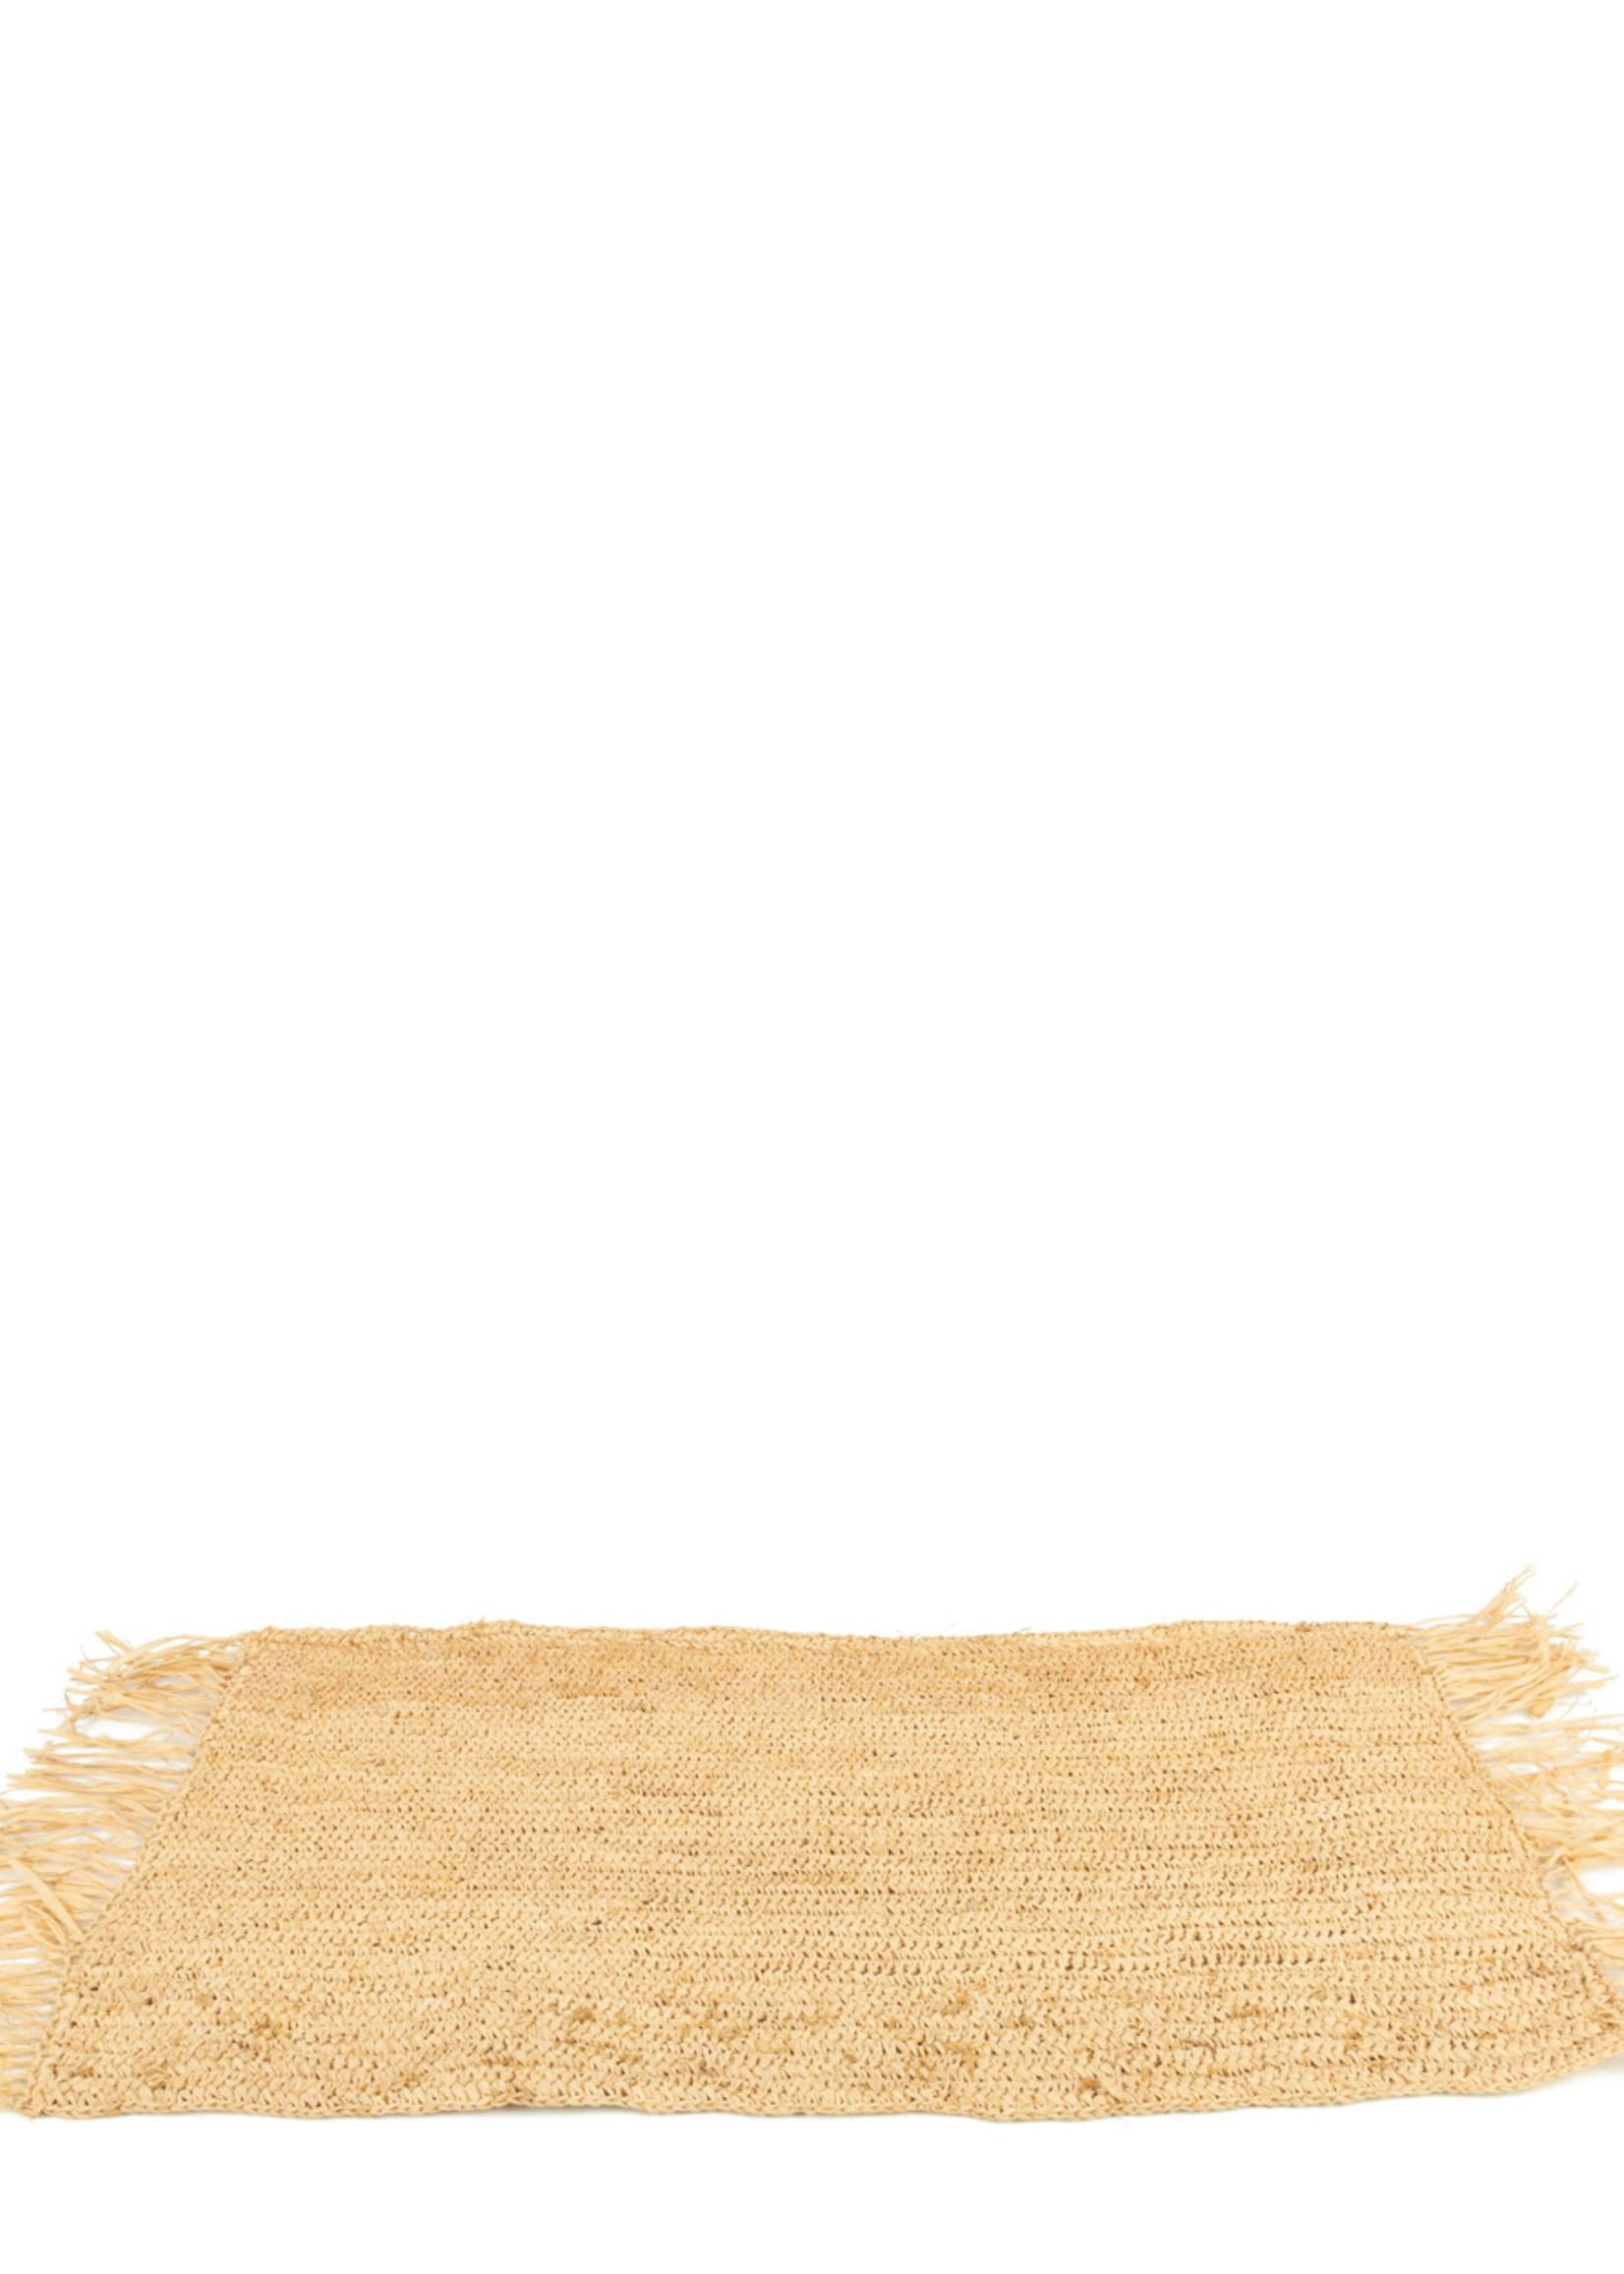 The Raffia Centerpiece  - Rectangular - Natural